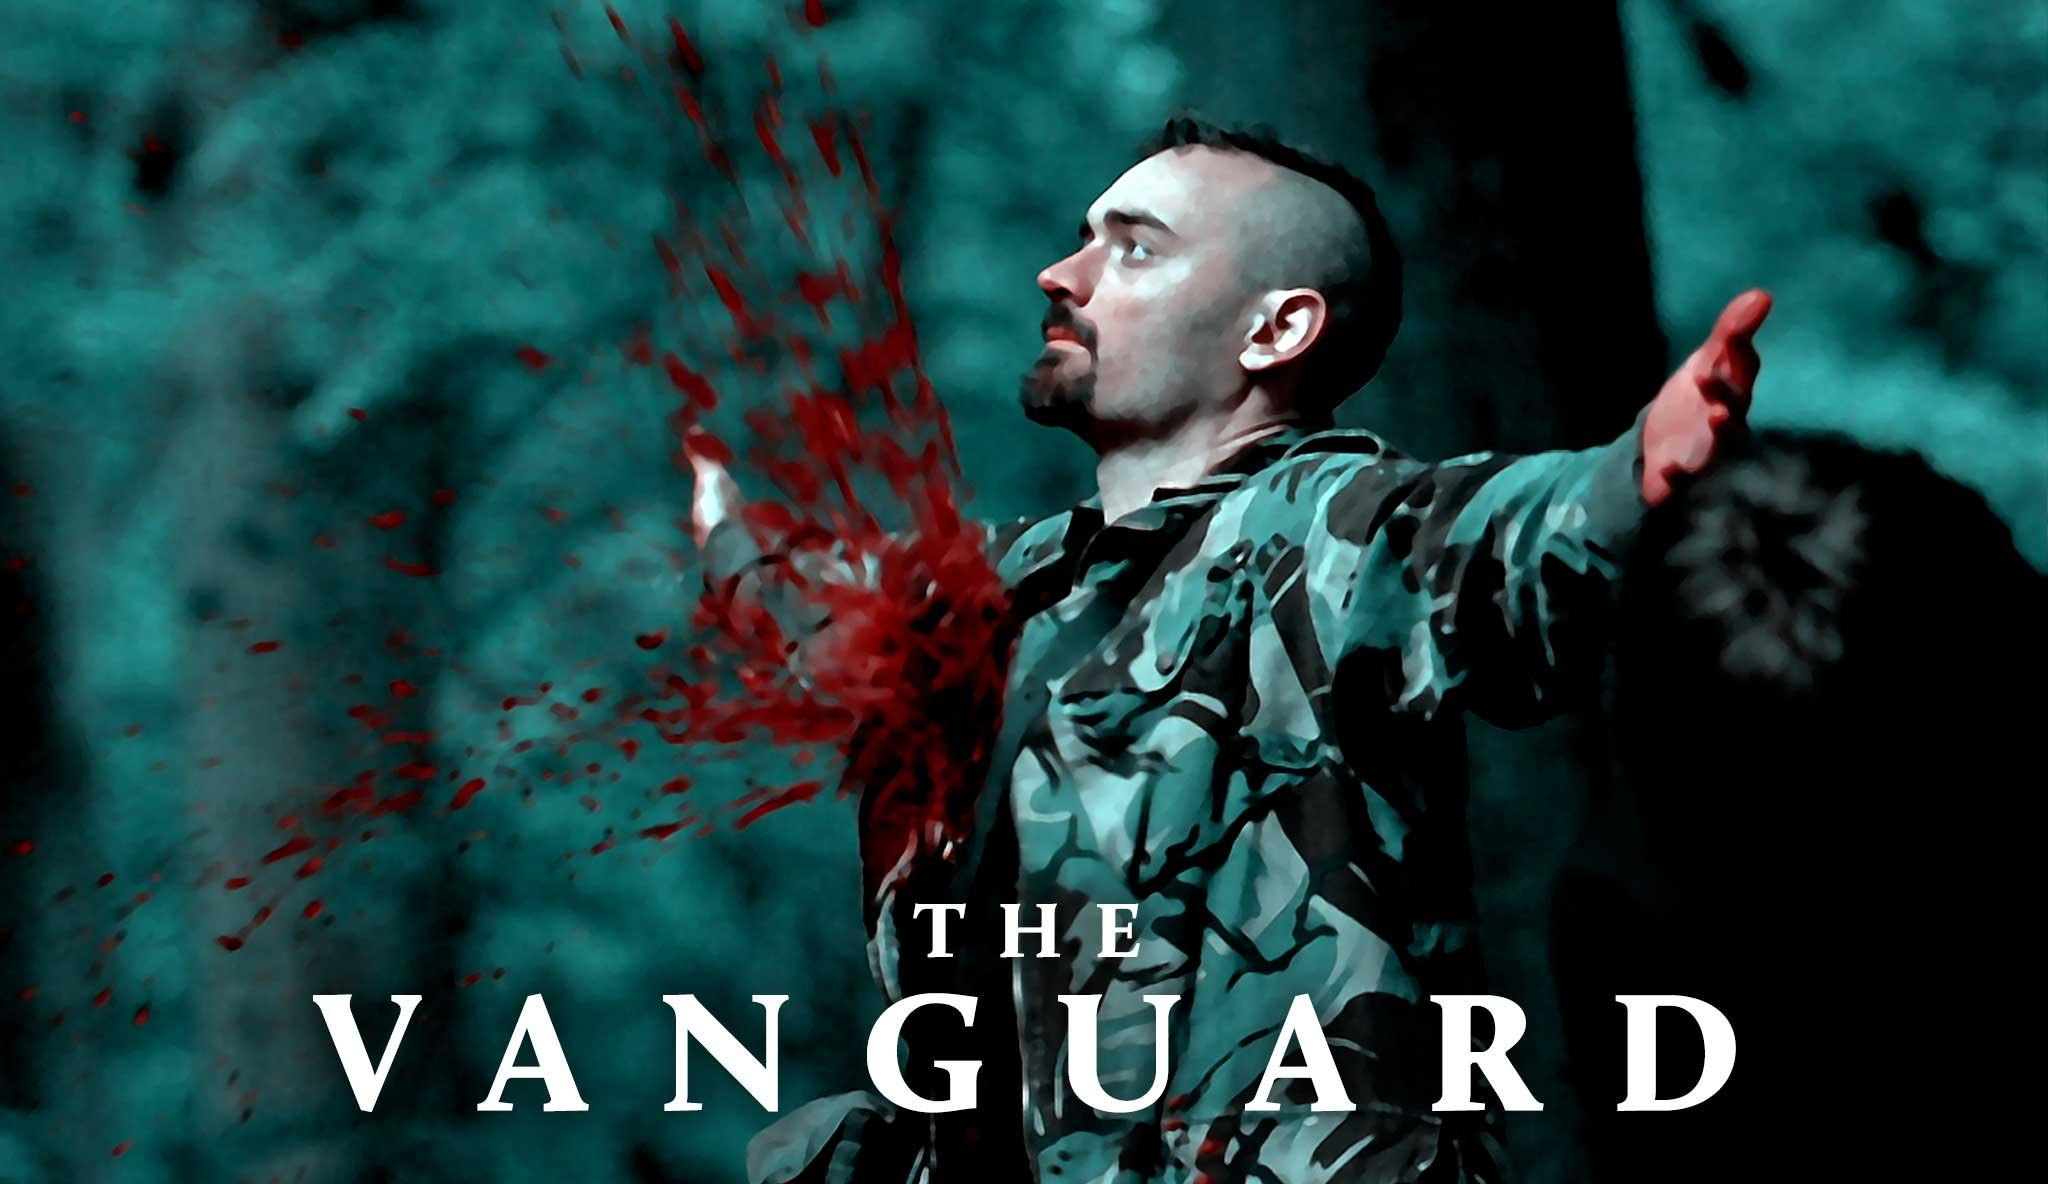 the-vanguard\header.jpg